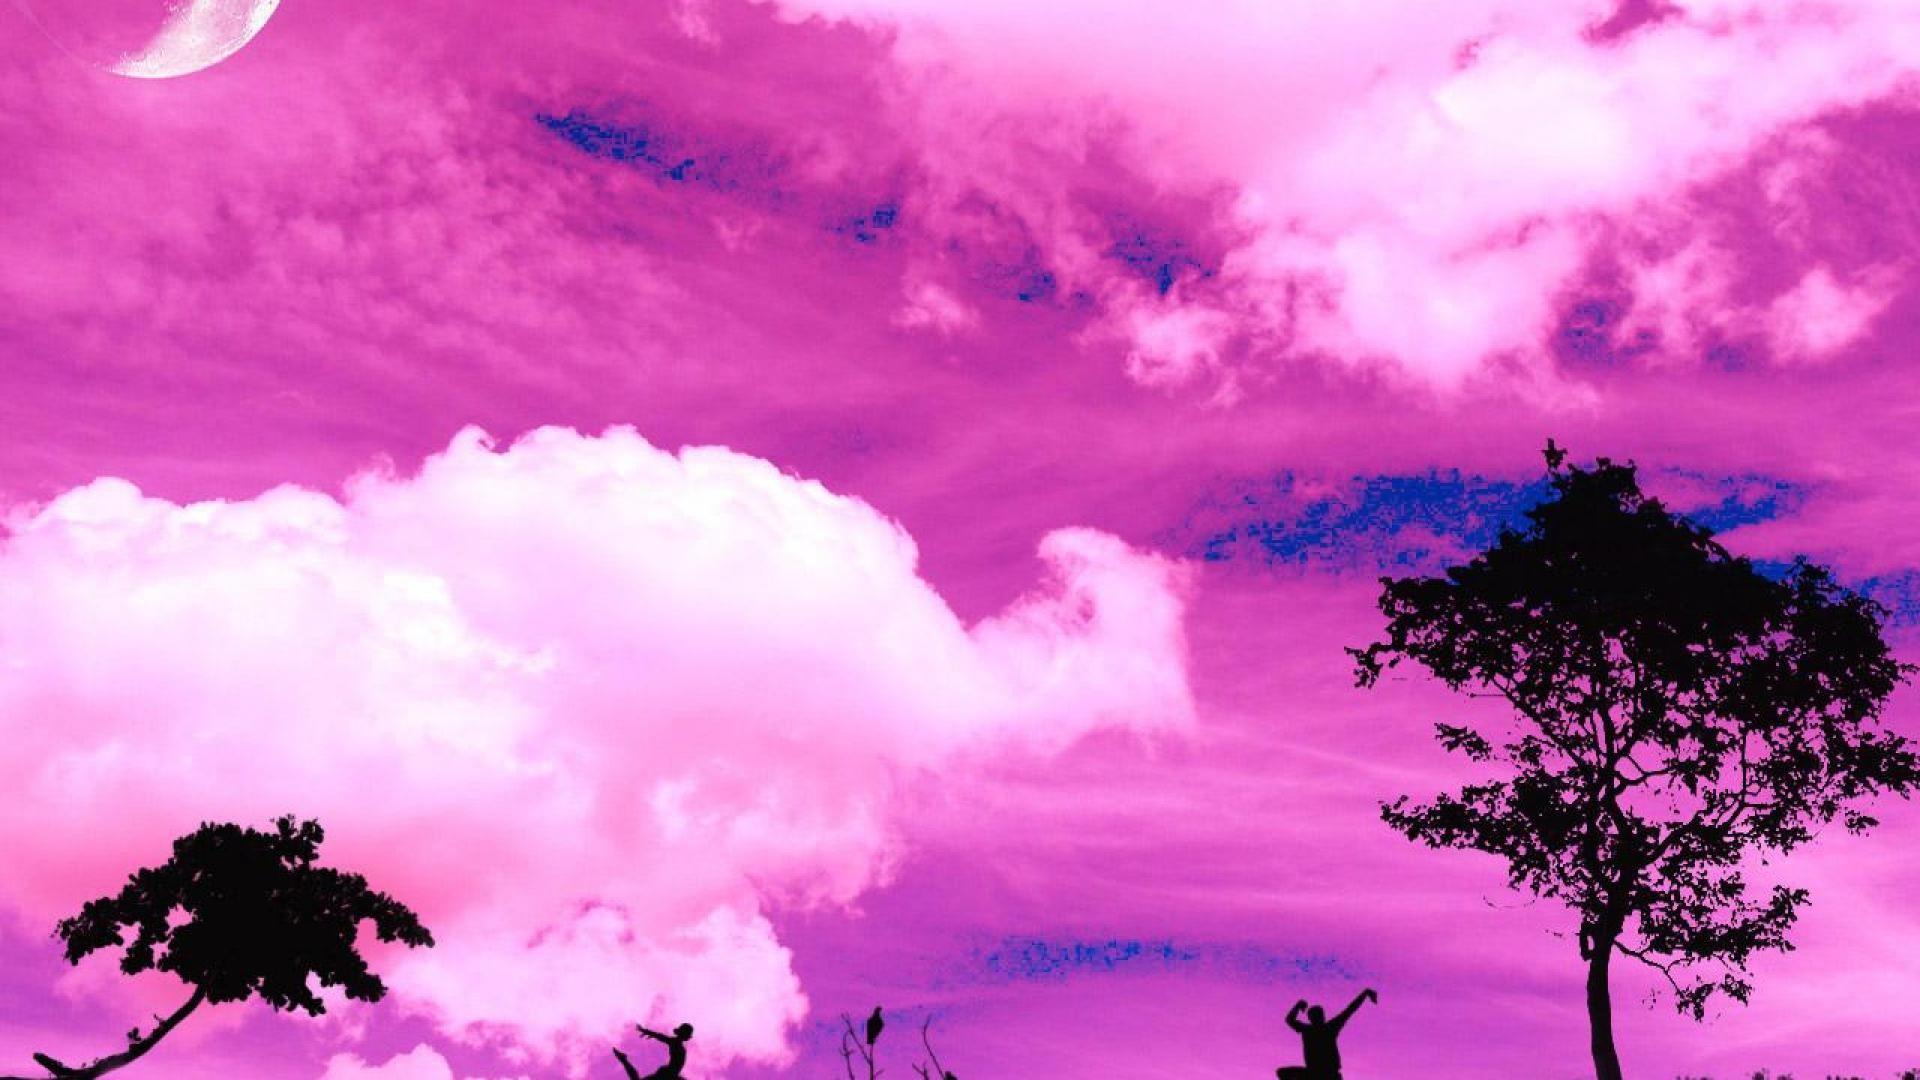 Raiders Wallpaper 3d Pink Love Background 183 ①